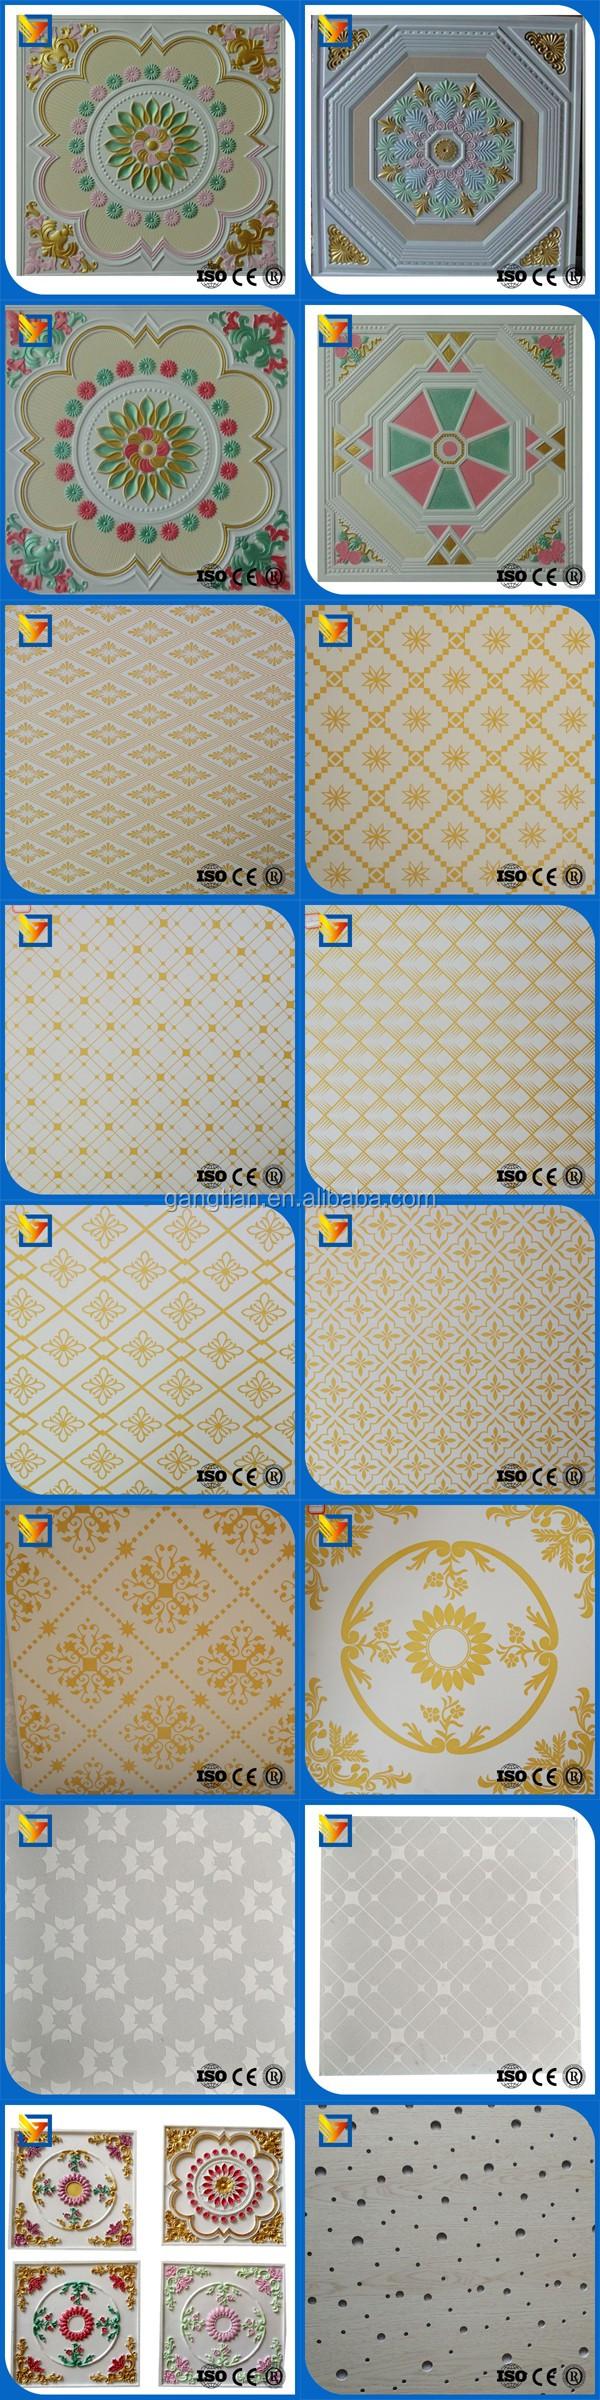 Colored Plasterboard Ceiling Gypsum Board Grg Ceiling Tile